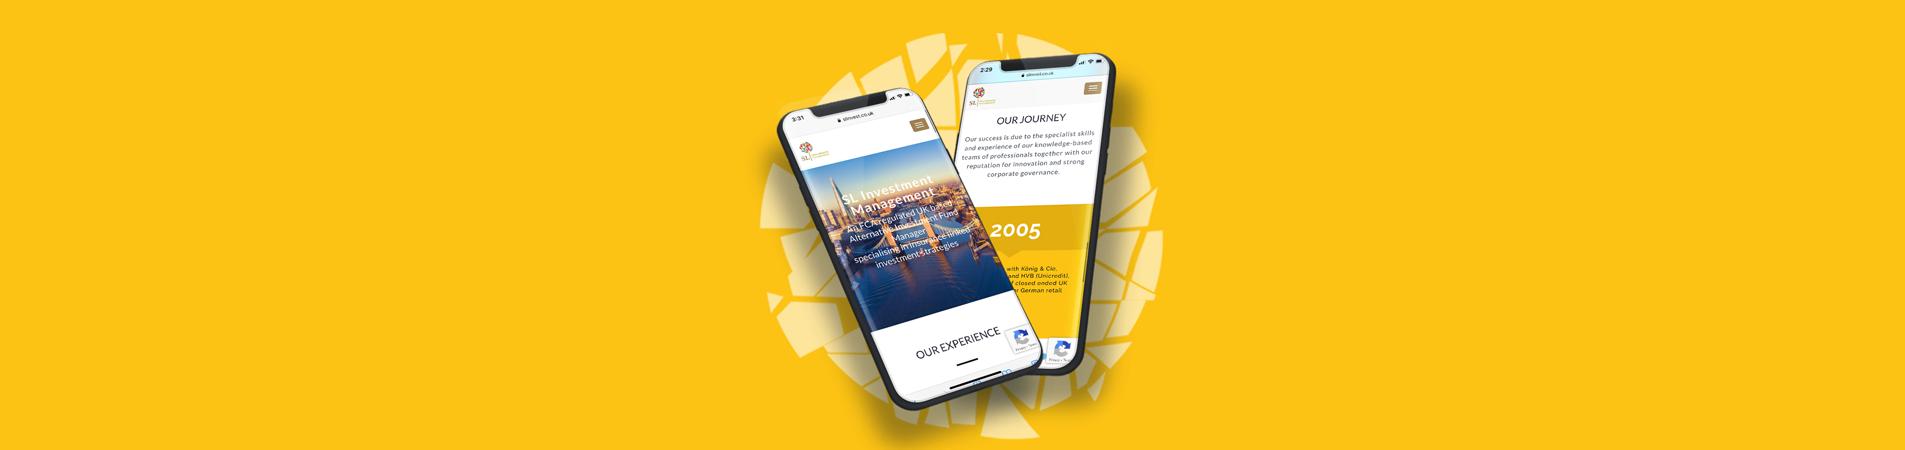 SL Invest website reveal